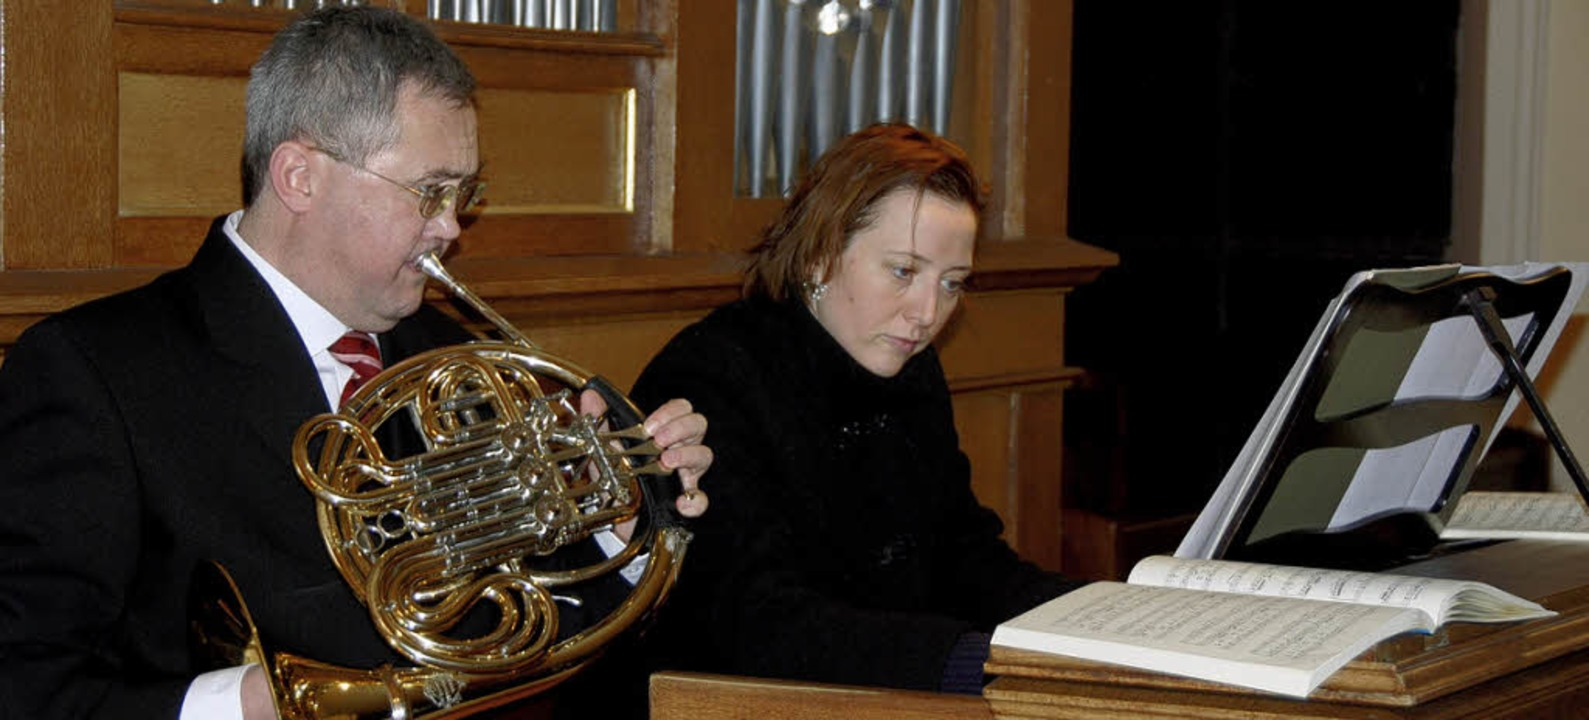 Arkardiusz Saternus (Horn) und Uraniah Keil (Orgel)   | Foto: Roland Vitt